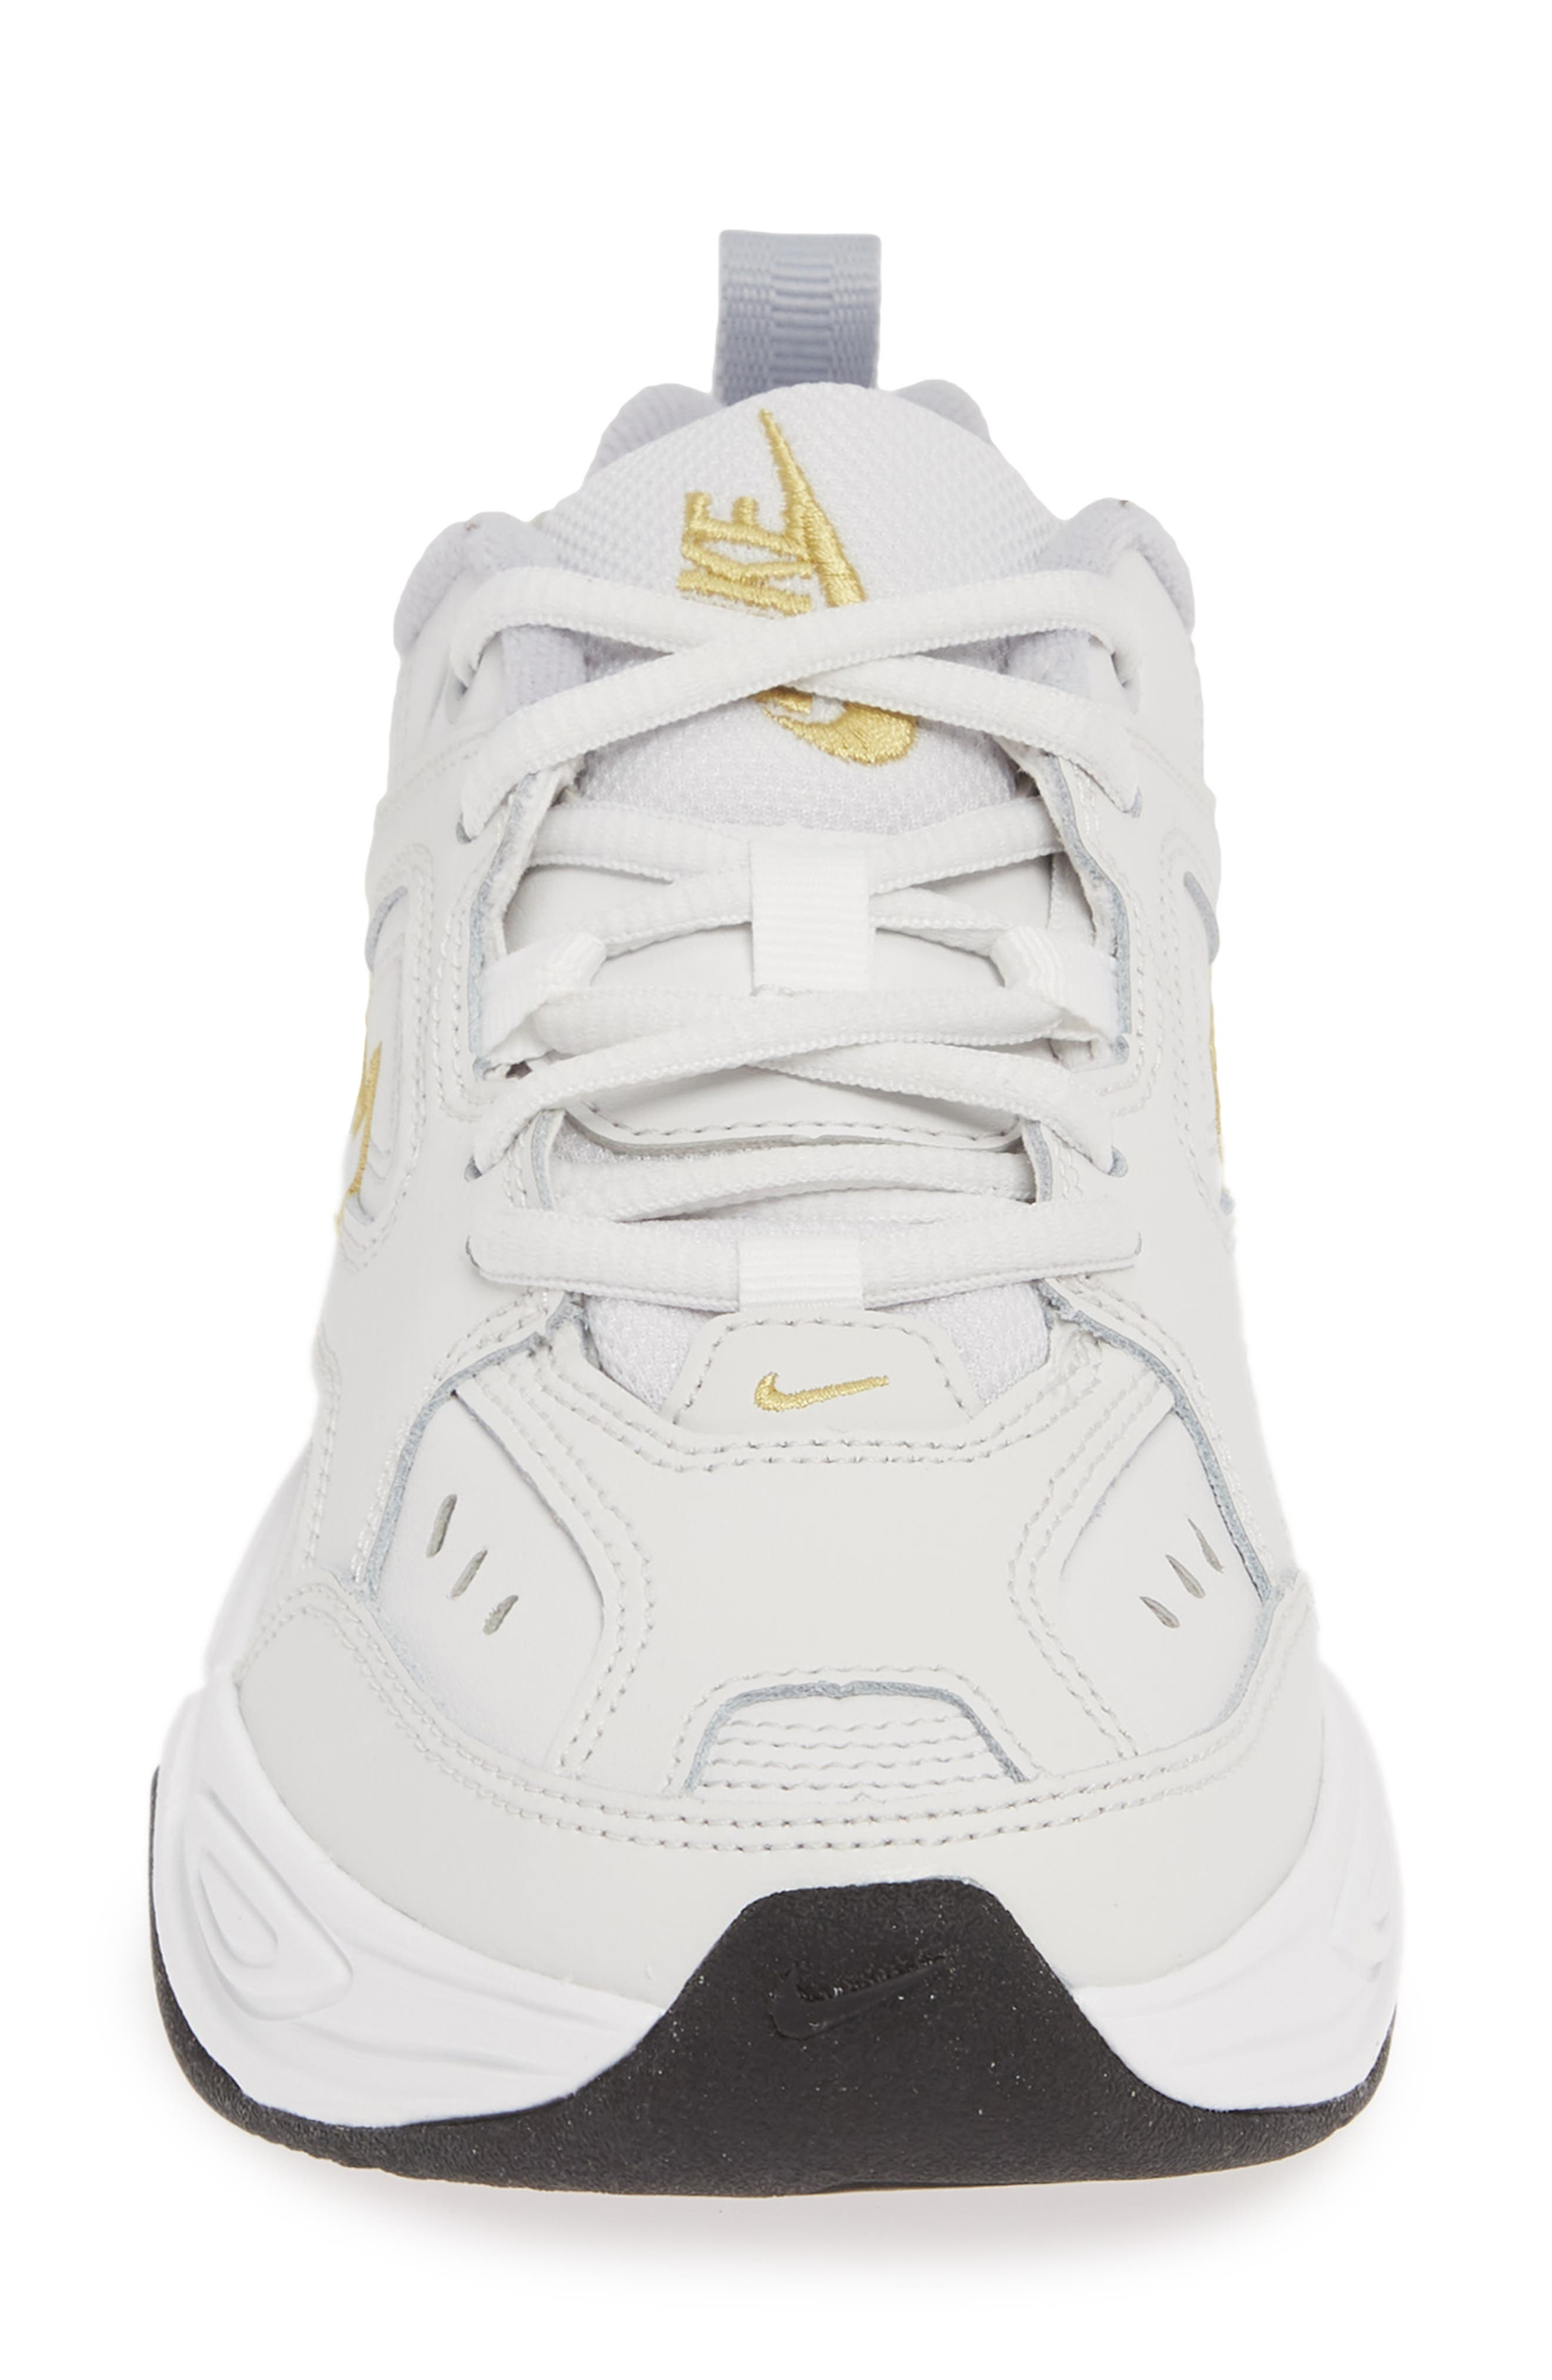 M2K Tekno Sneaker,                             Alternate thumbnail 4, color,                             PLATINUM TINT/ CELERY/ GREY